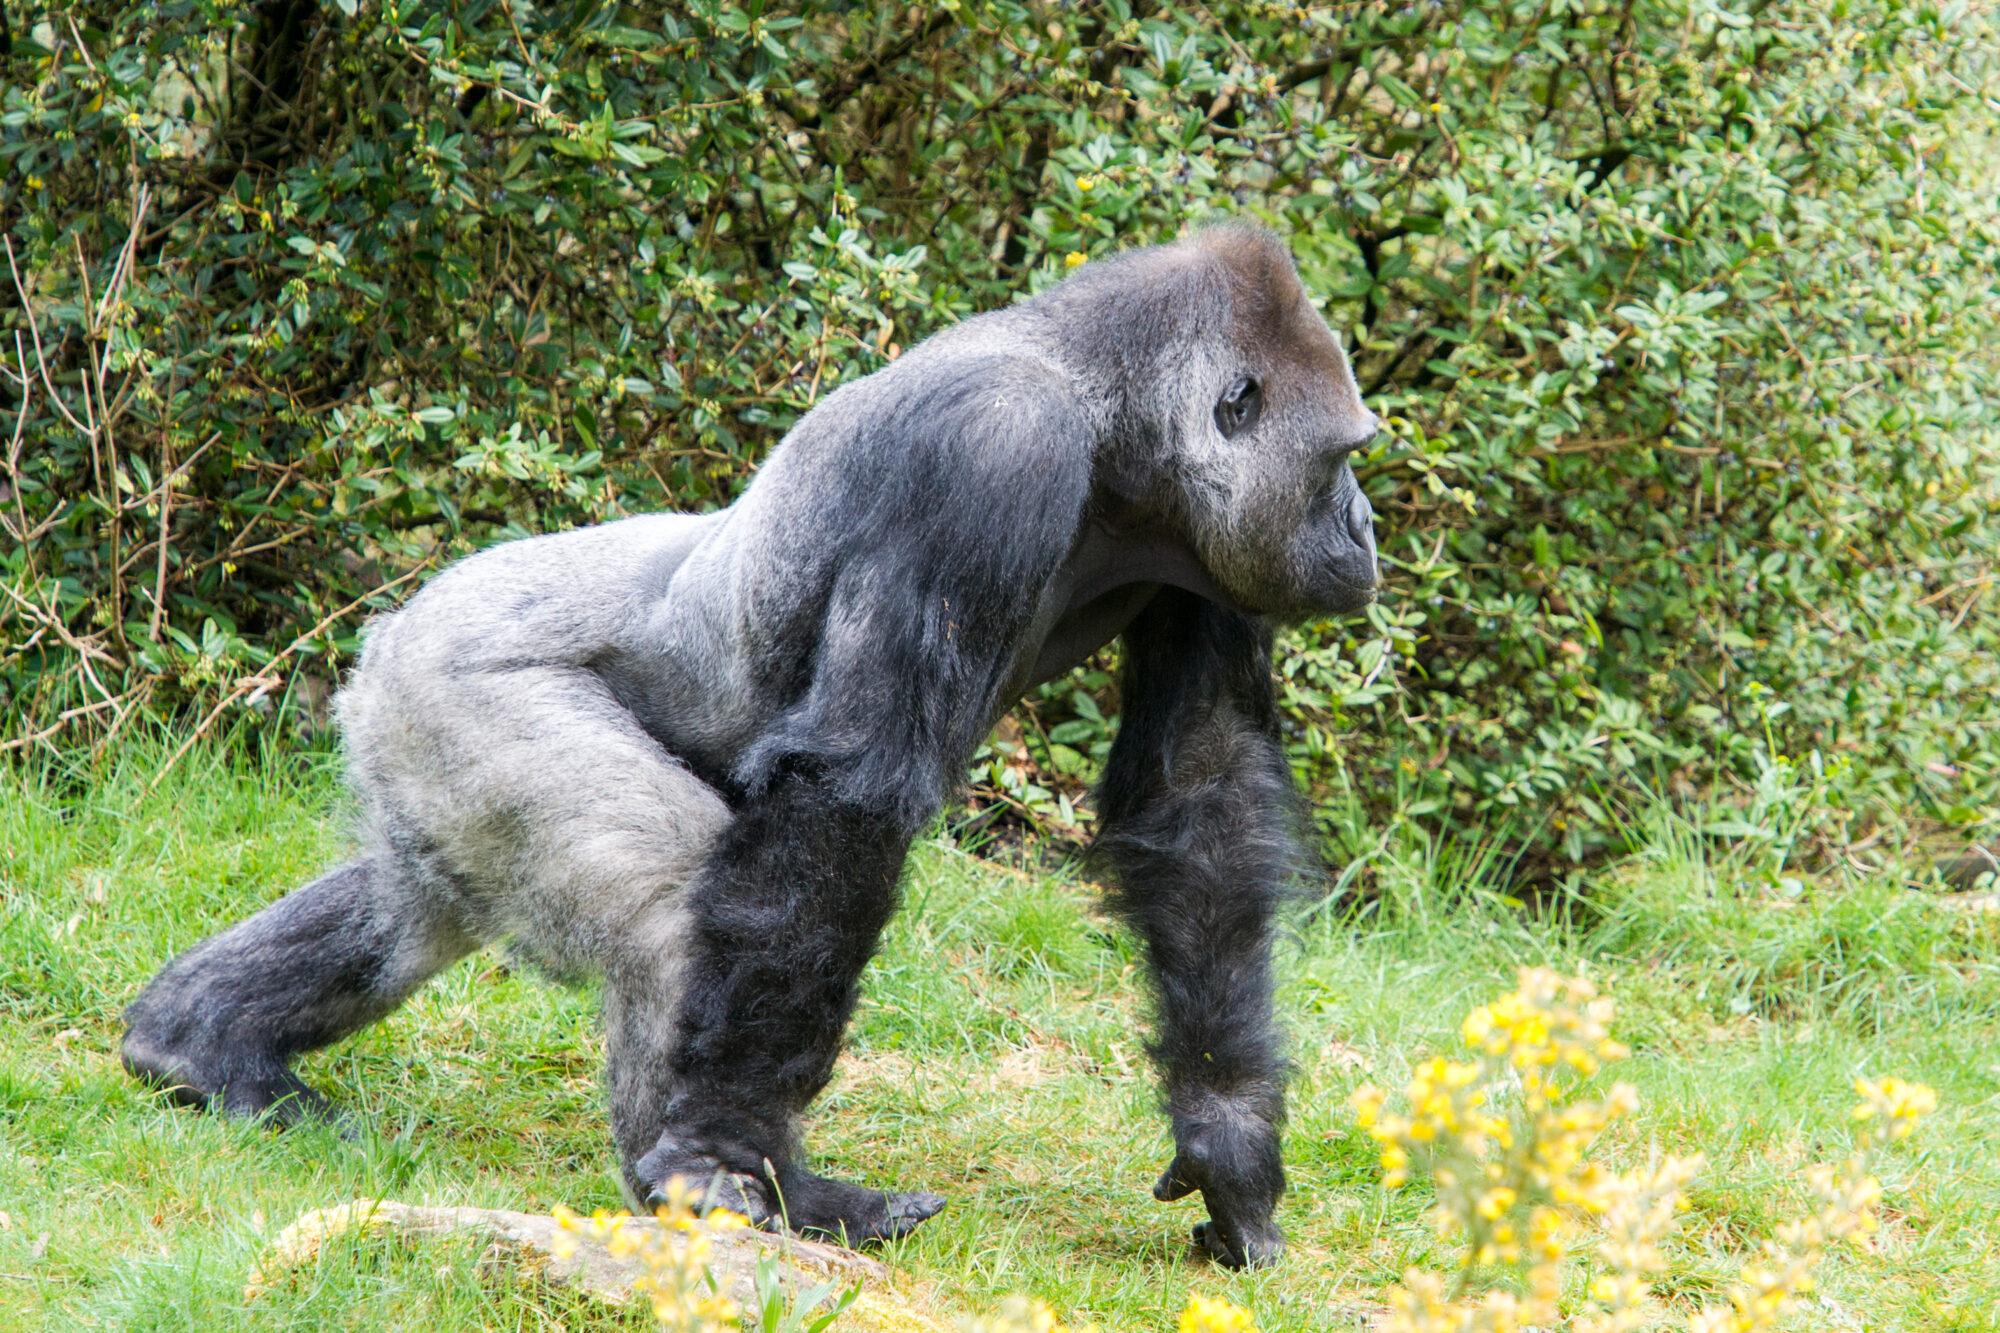 Gorillababy op komst in Apenheul